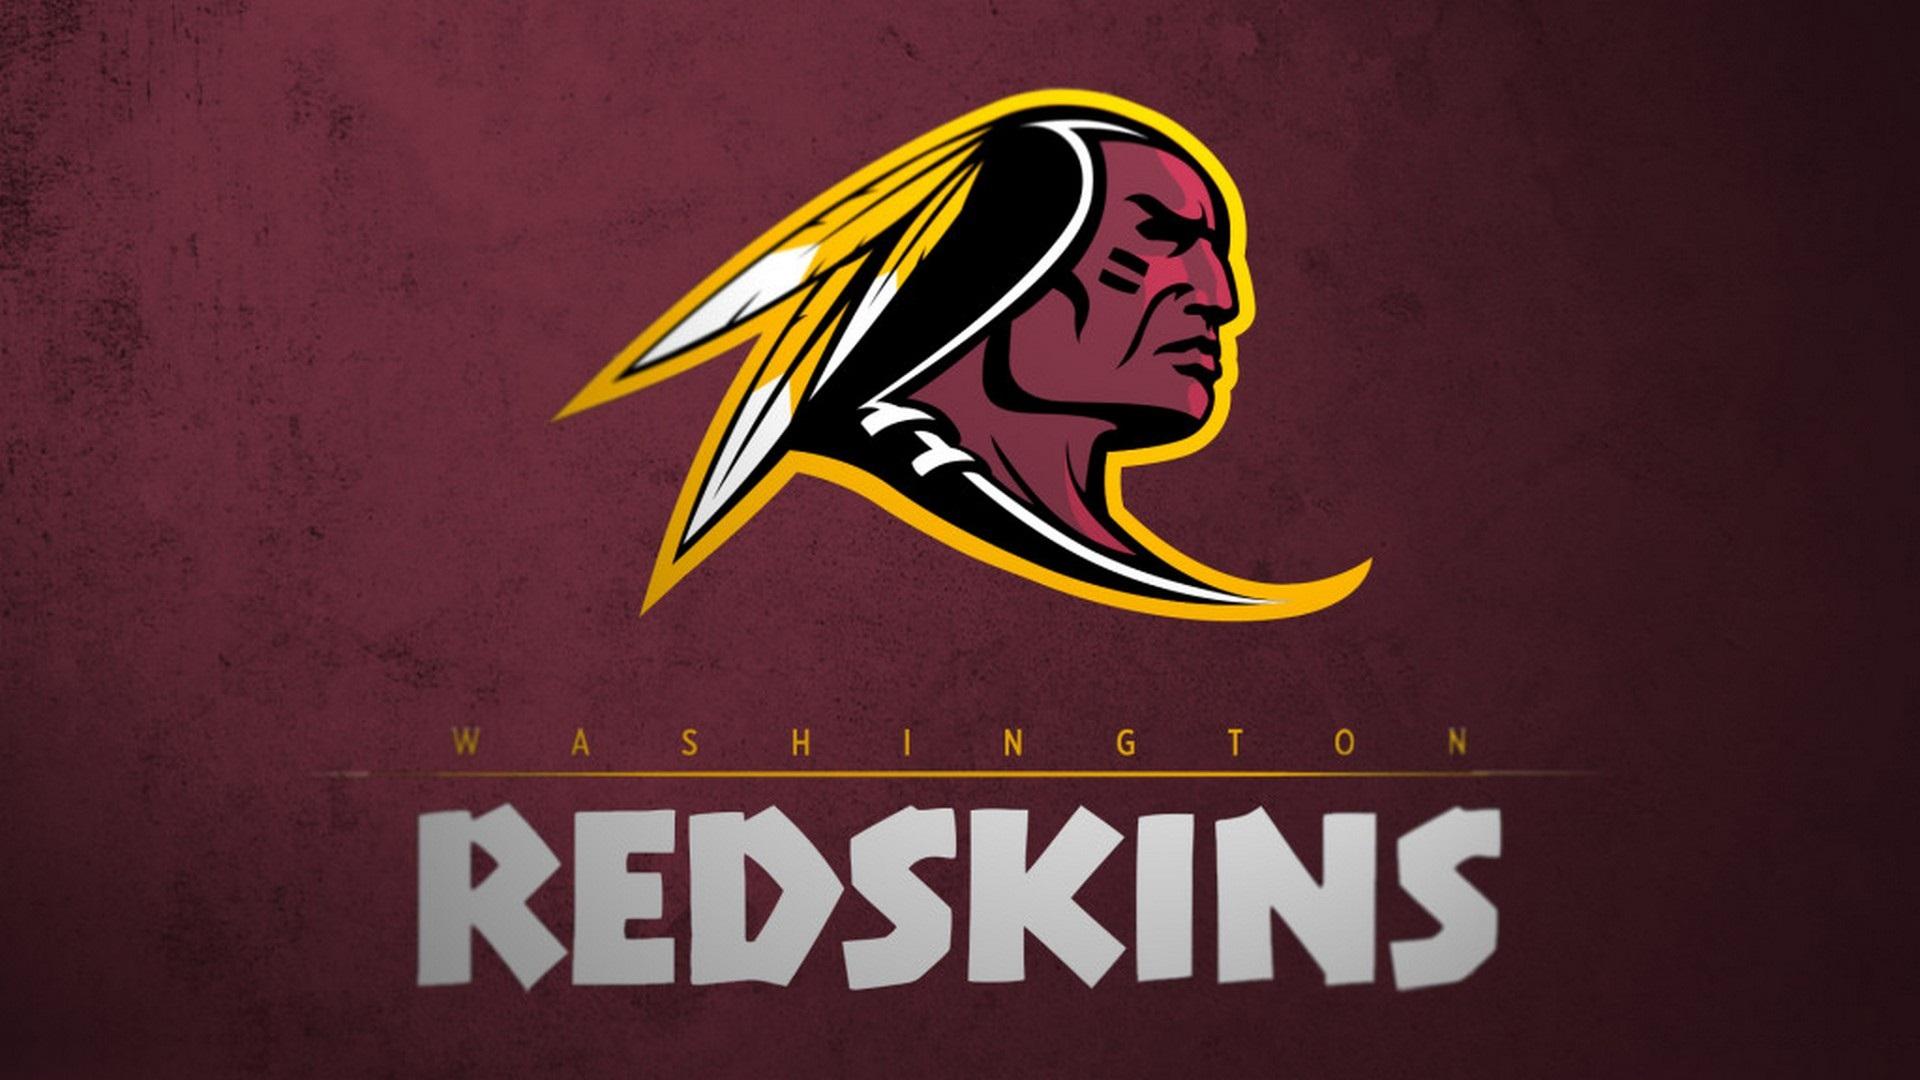 Windows Wallpaper Washington Redskins 2020 NFL Football Wallpapers 1920x1080